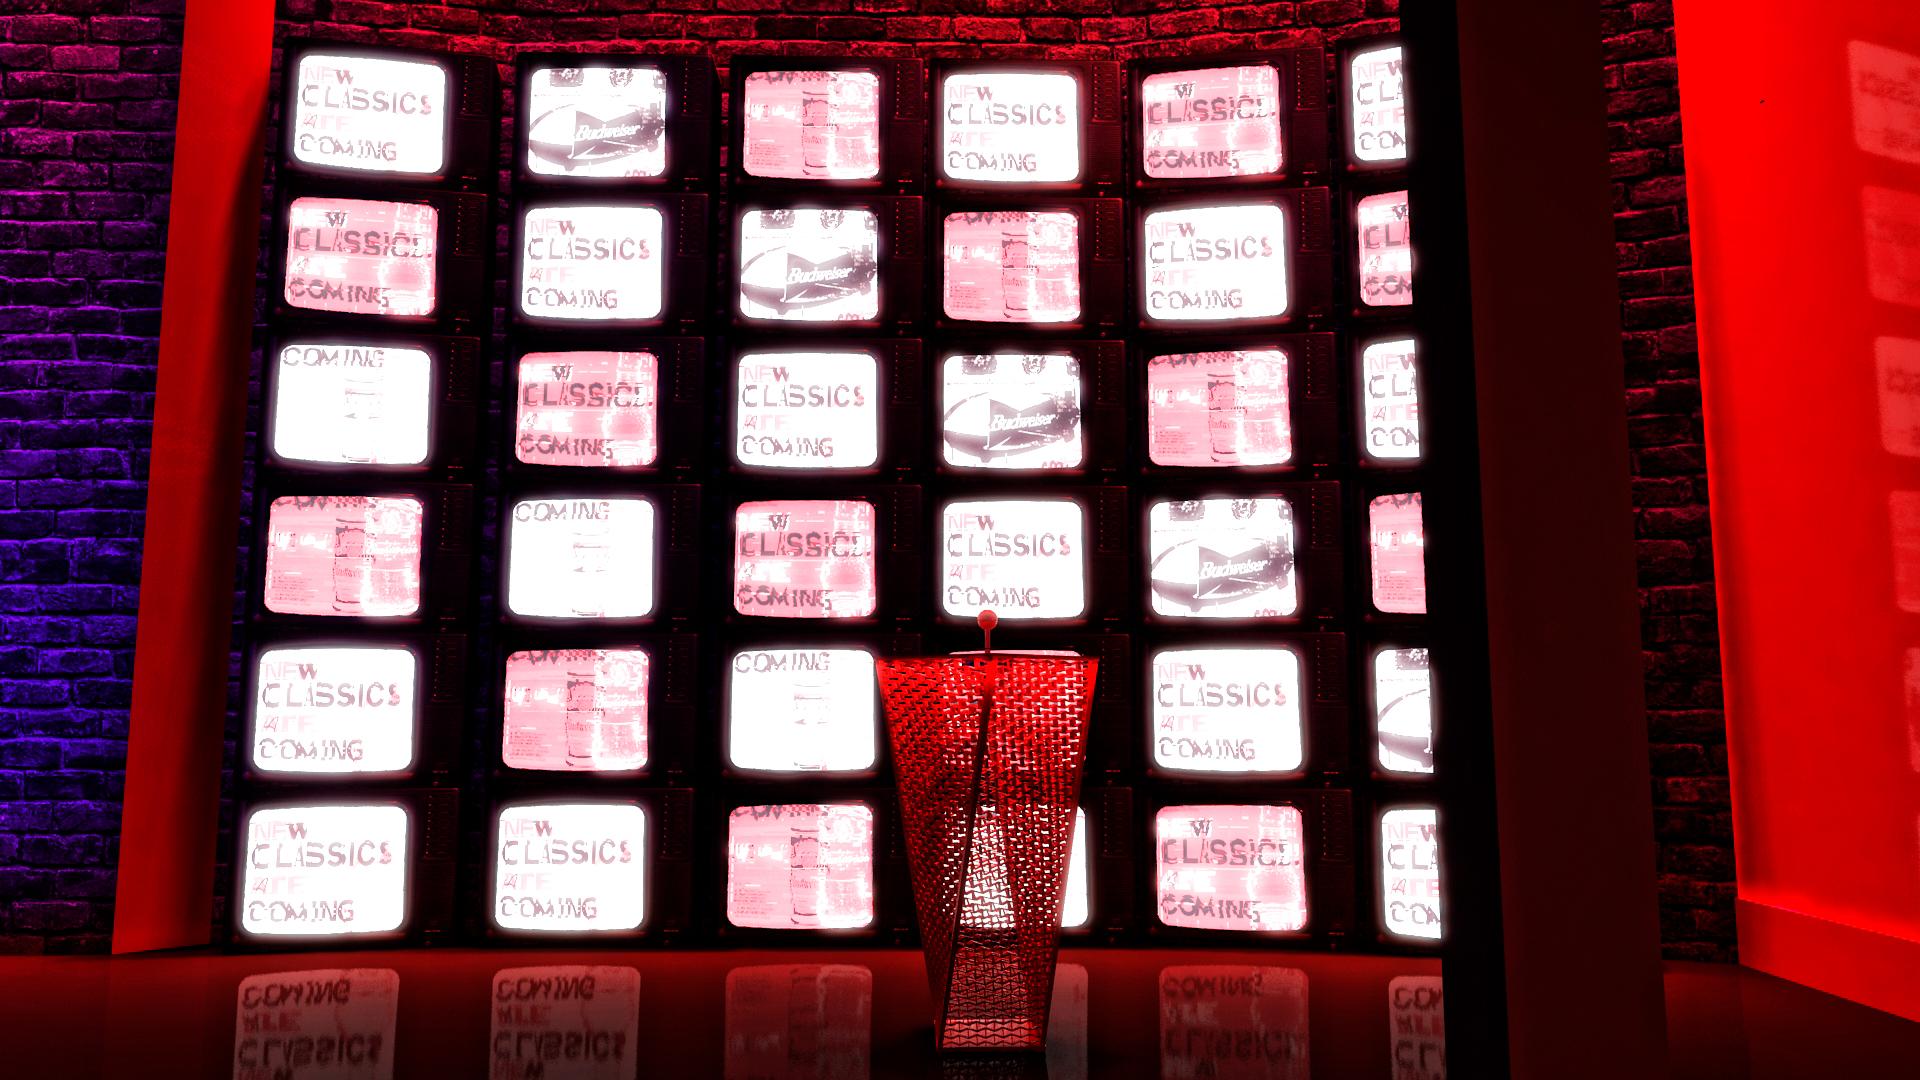 Budweiser_Lollapalooza_BoomBox_View12.jpg